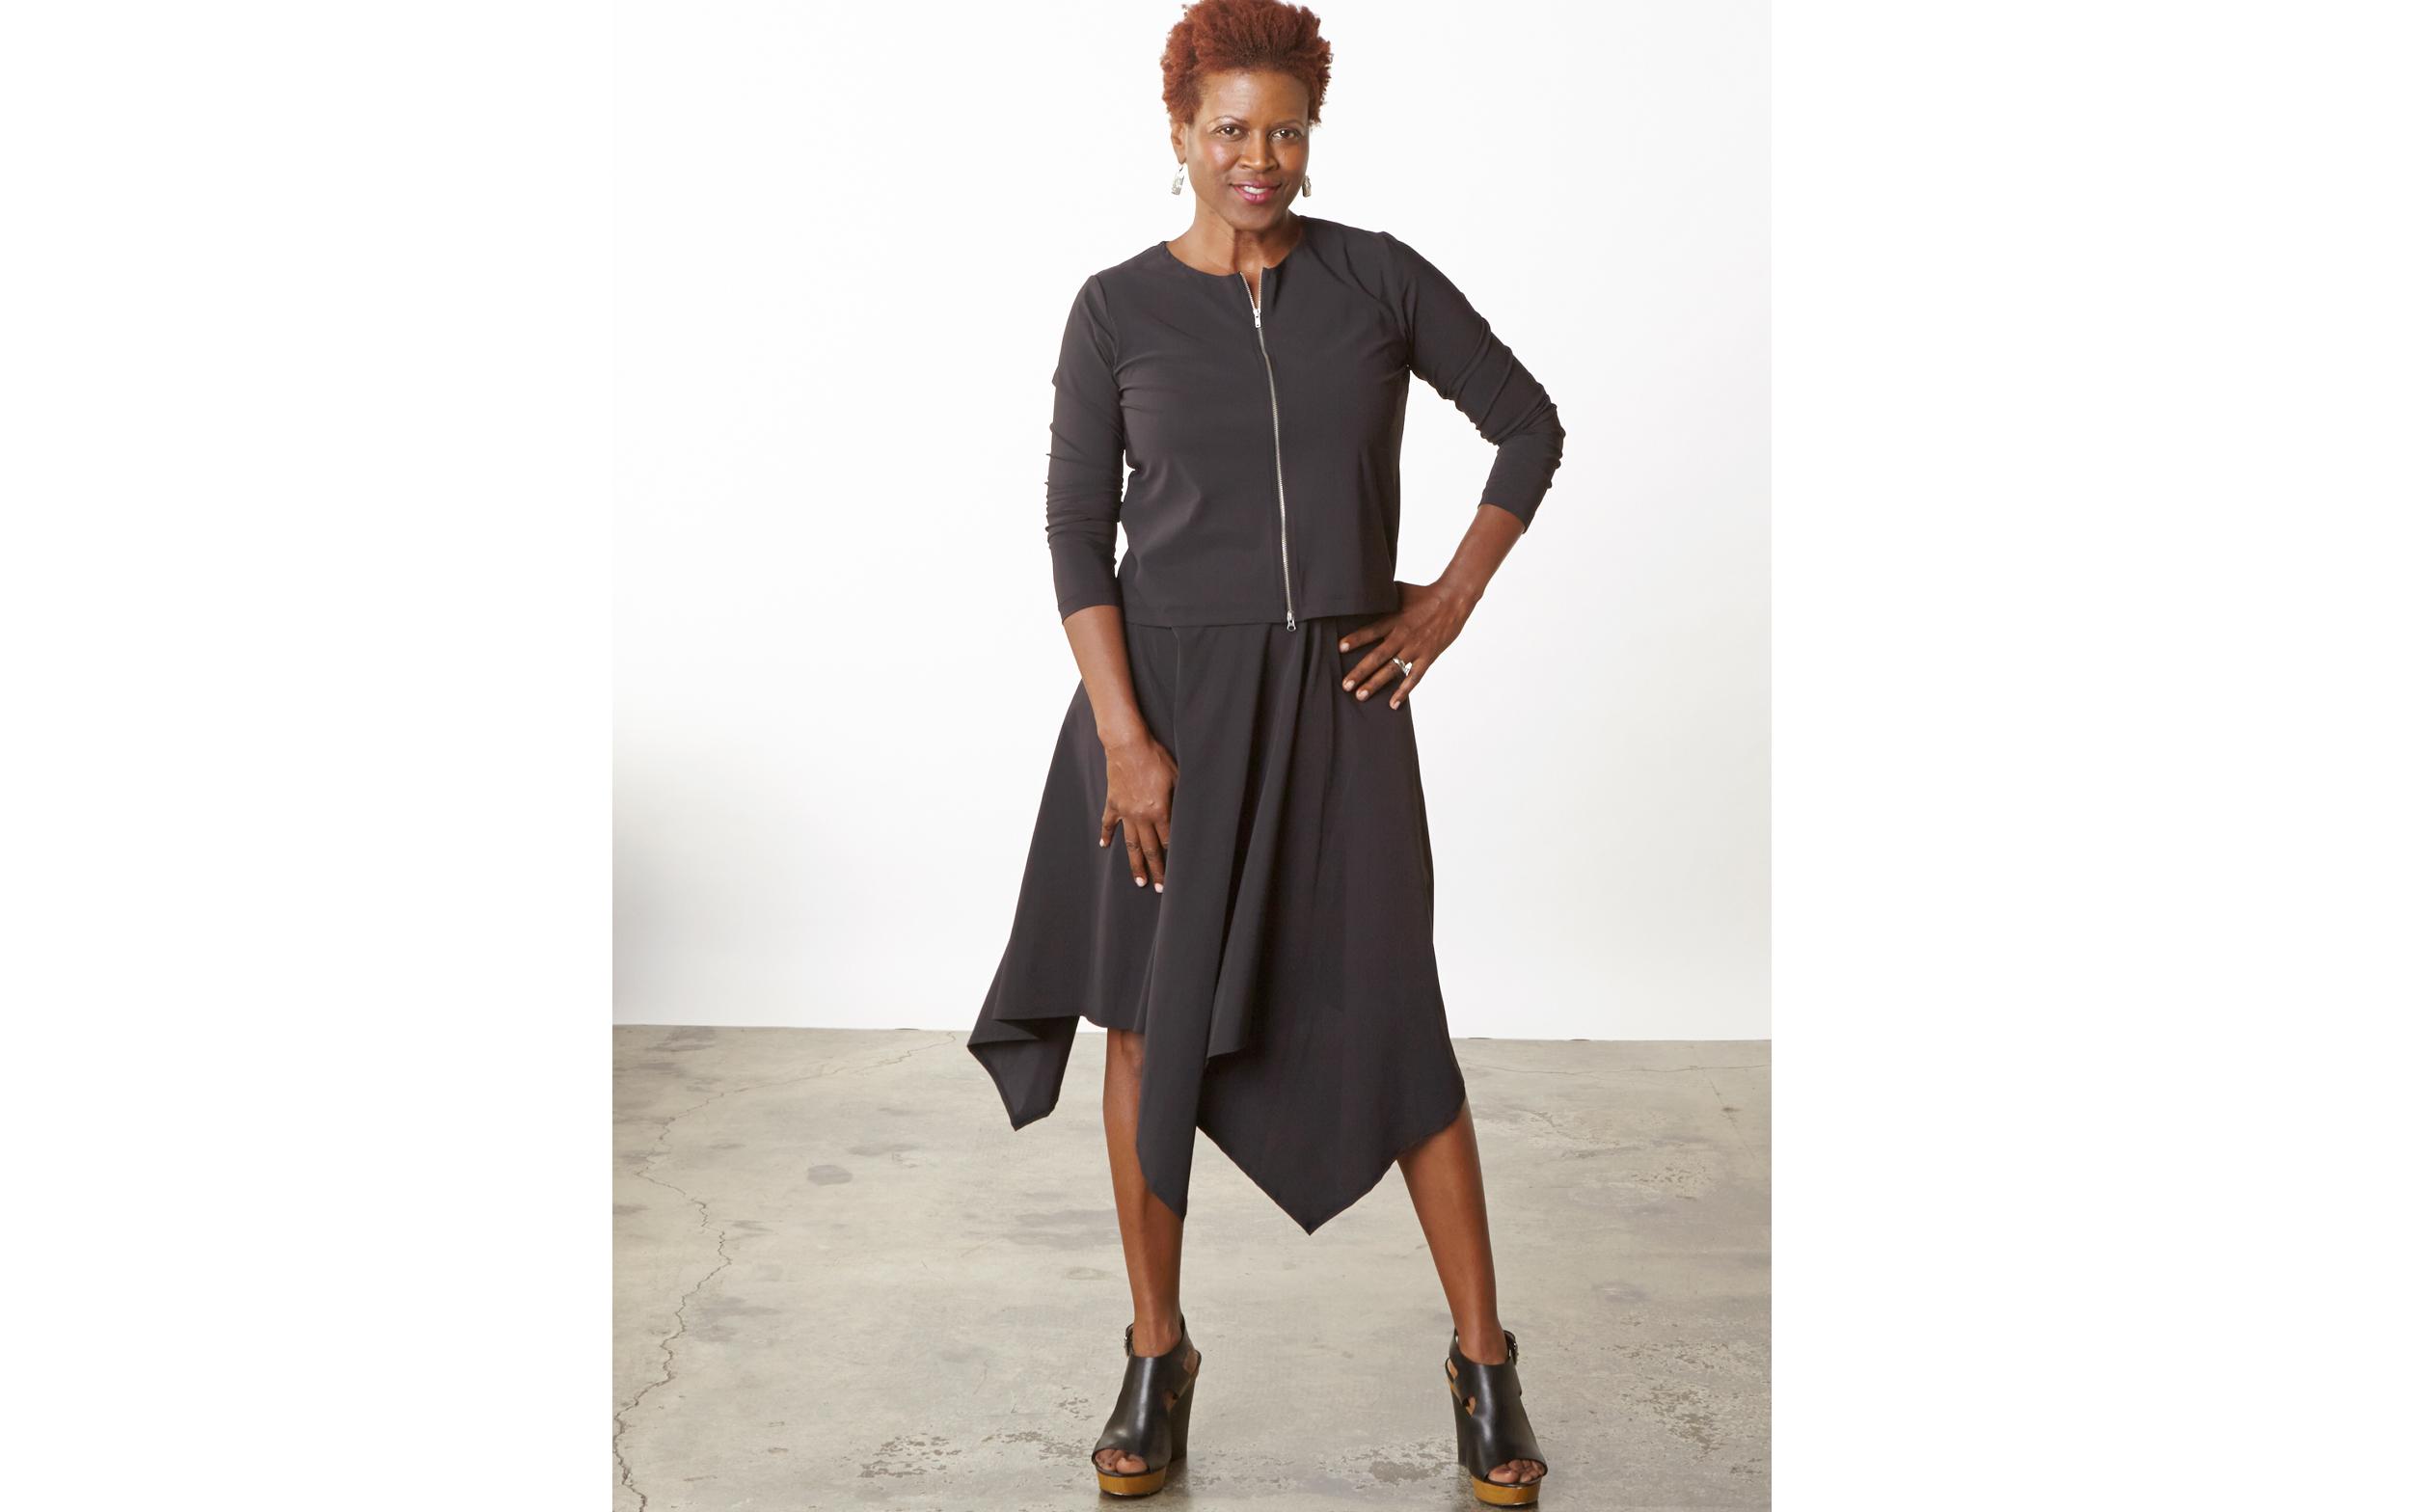 Betz Cardigan, Bianca Skirt in Black Italian Microfiber Jersey